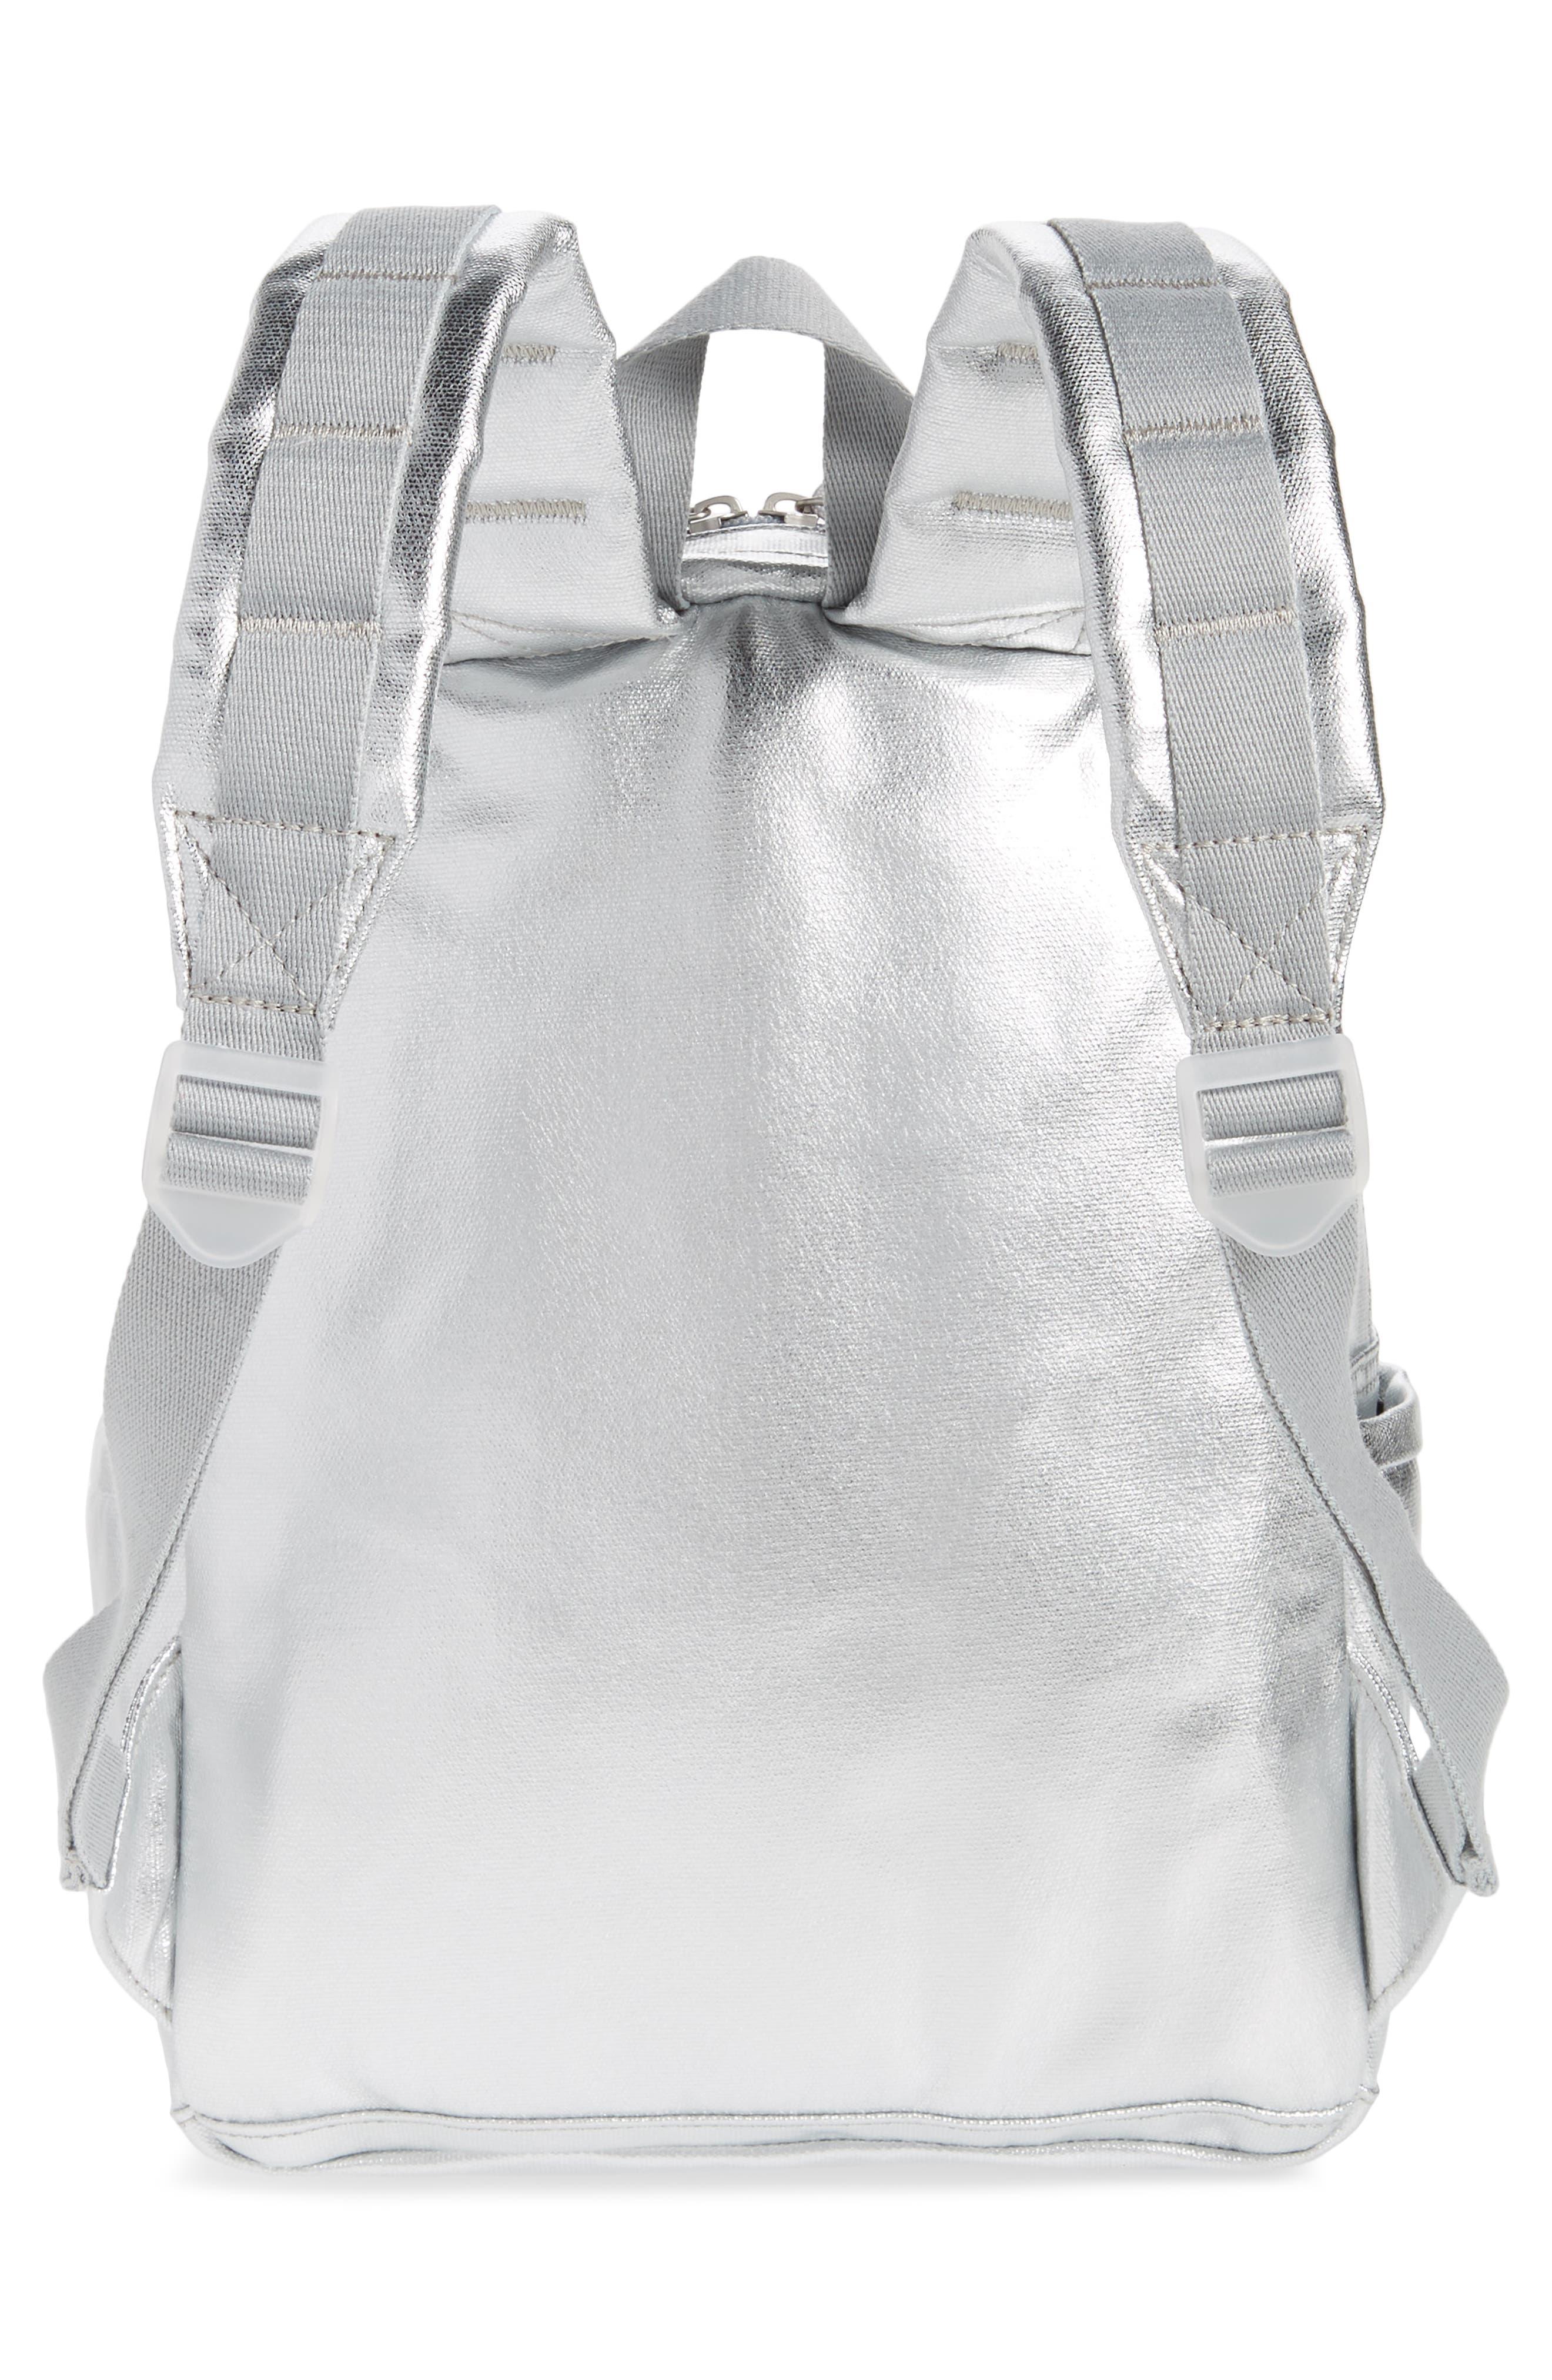 Downtown Mini Kane Canvas Backpack,                             Alternate thumbnail 3, color,                             041